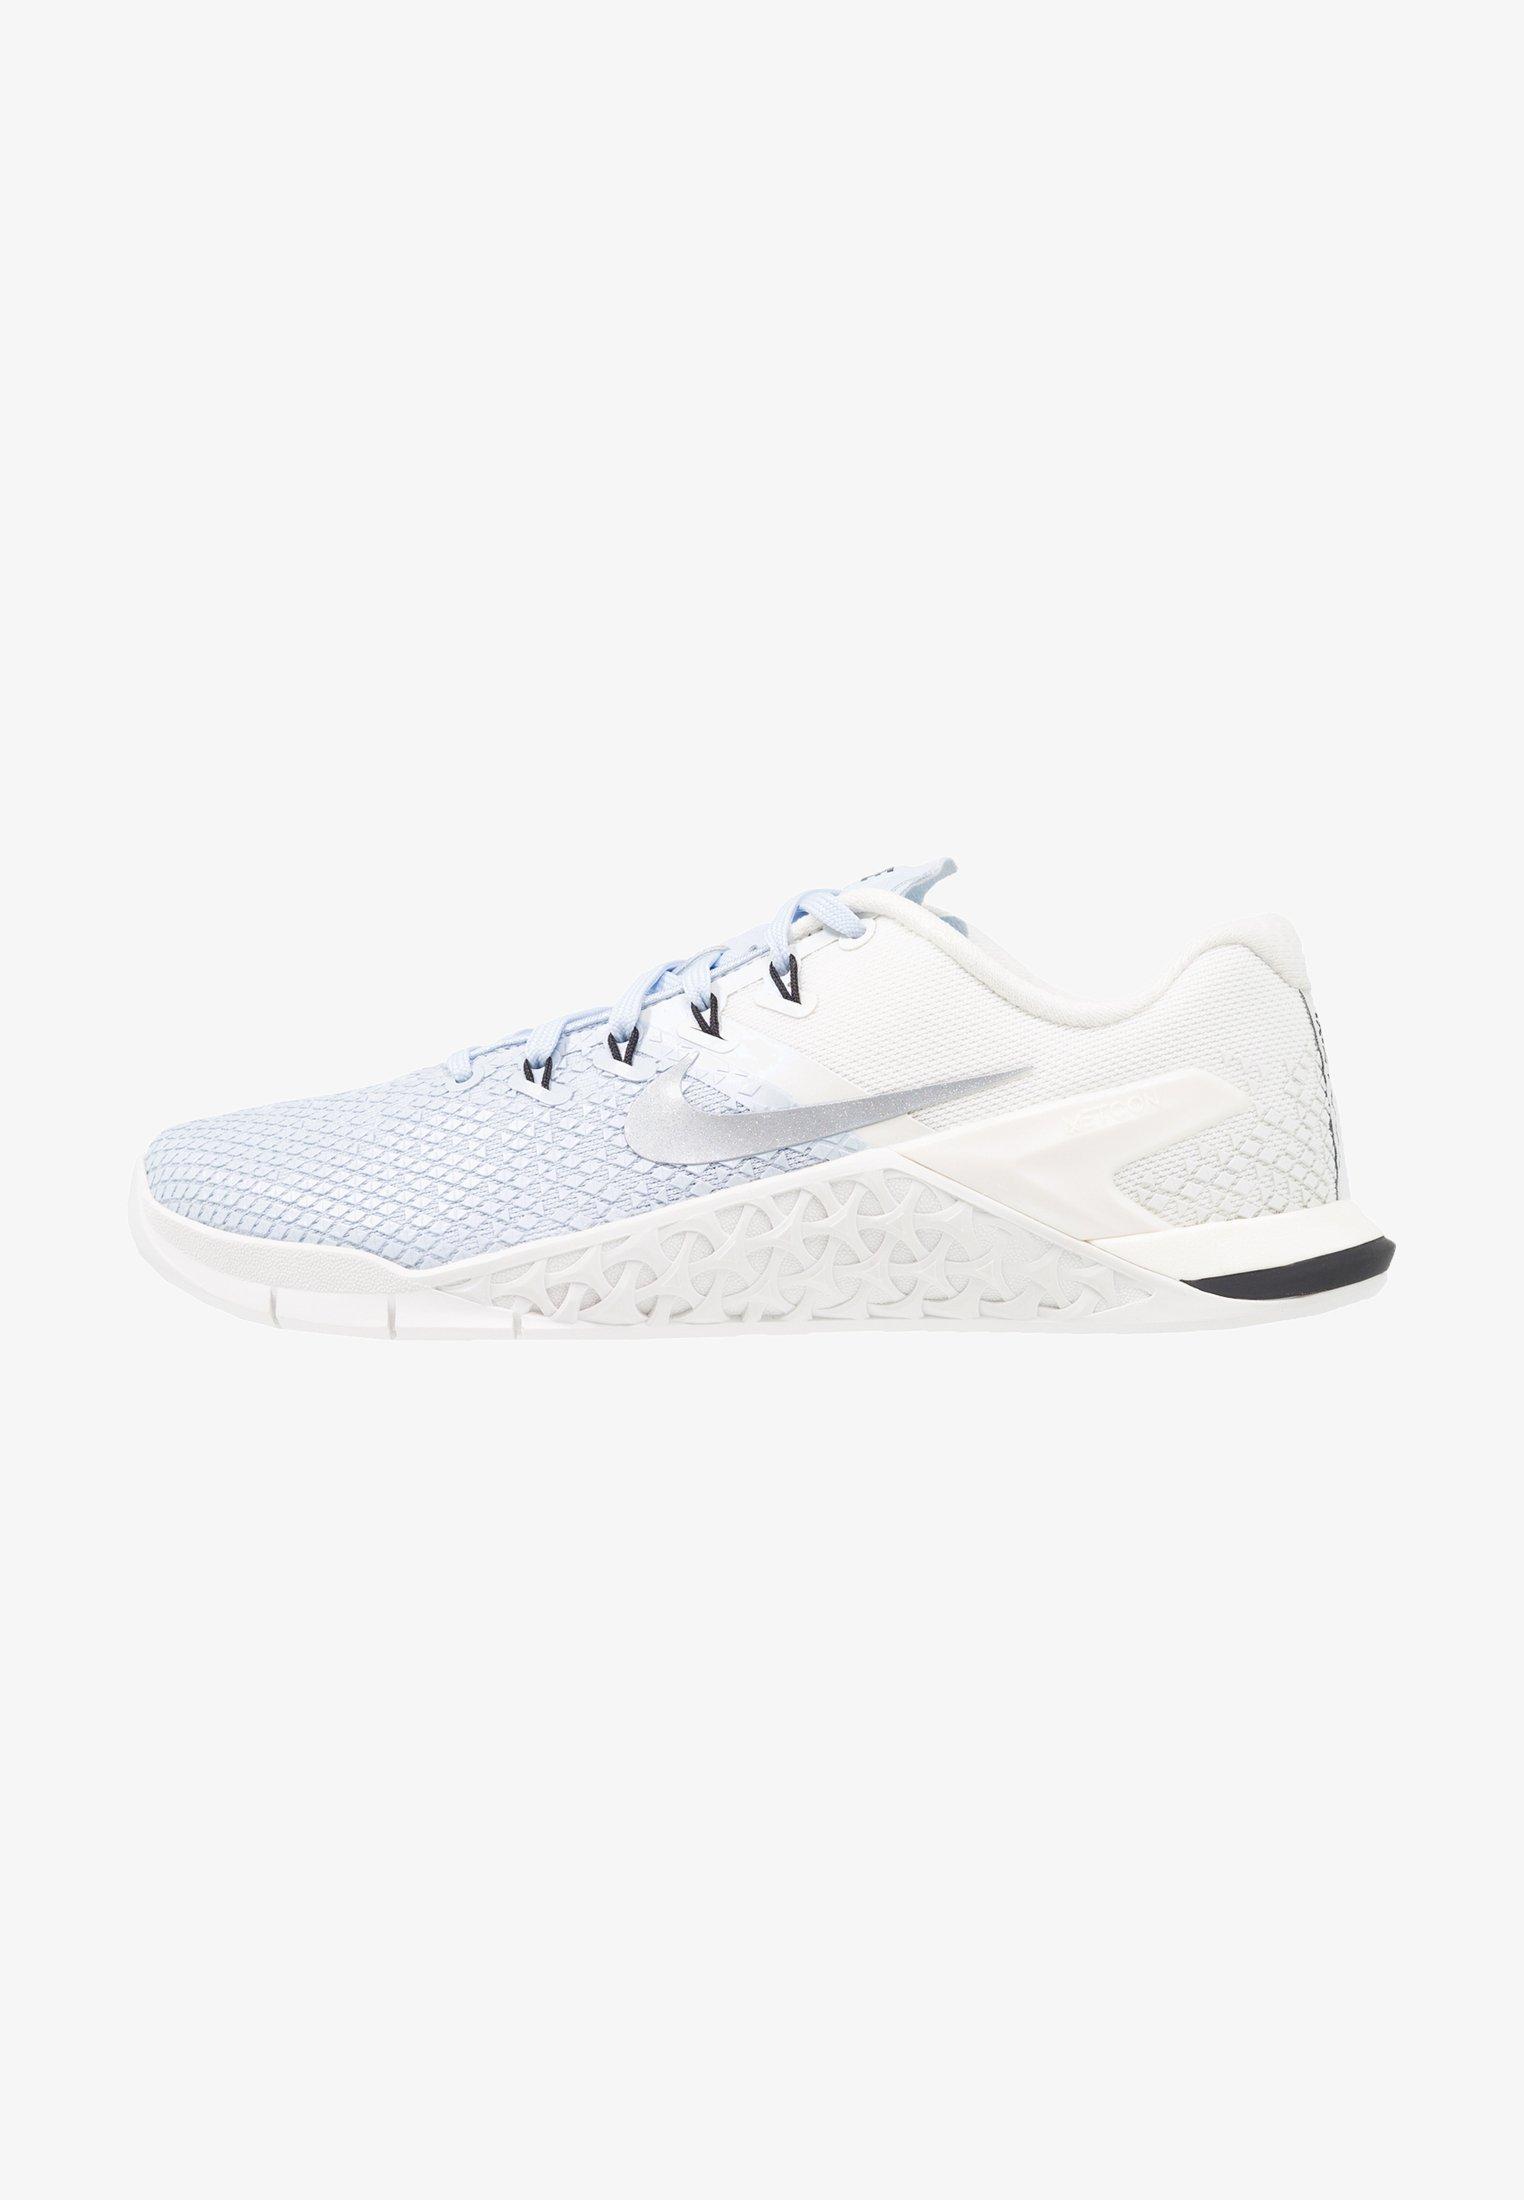 verdad Normalización segundo  Nike Performance METCON 4 XD - Sports shoes - half blue/metallic  silver/sail/black - Zalando.co.uk